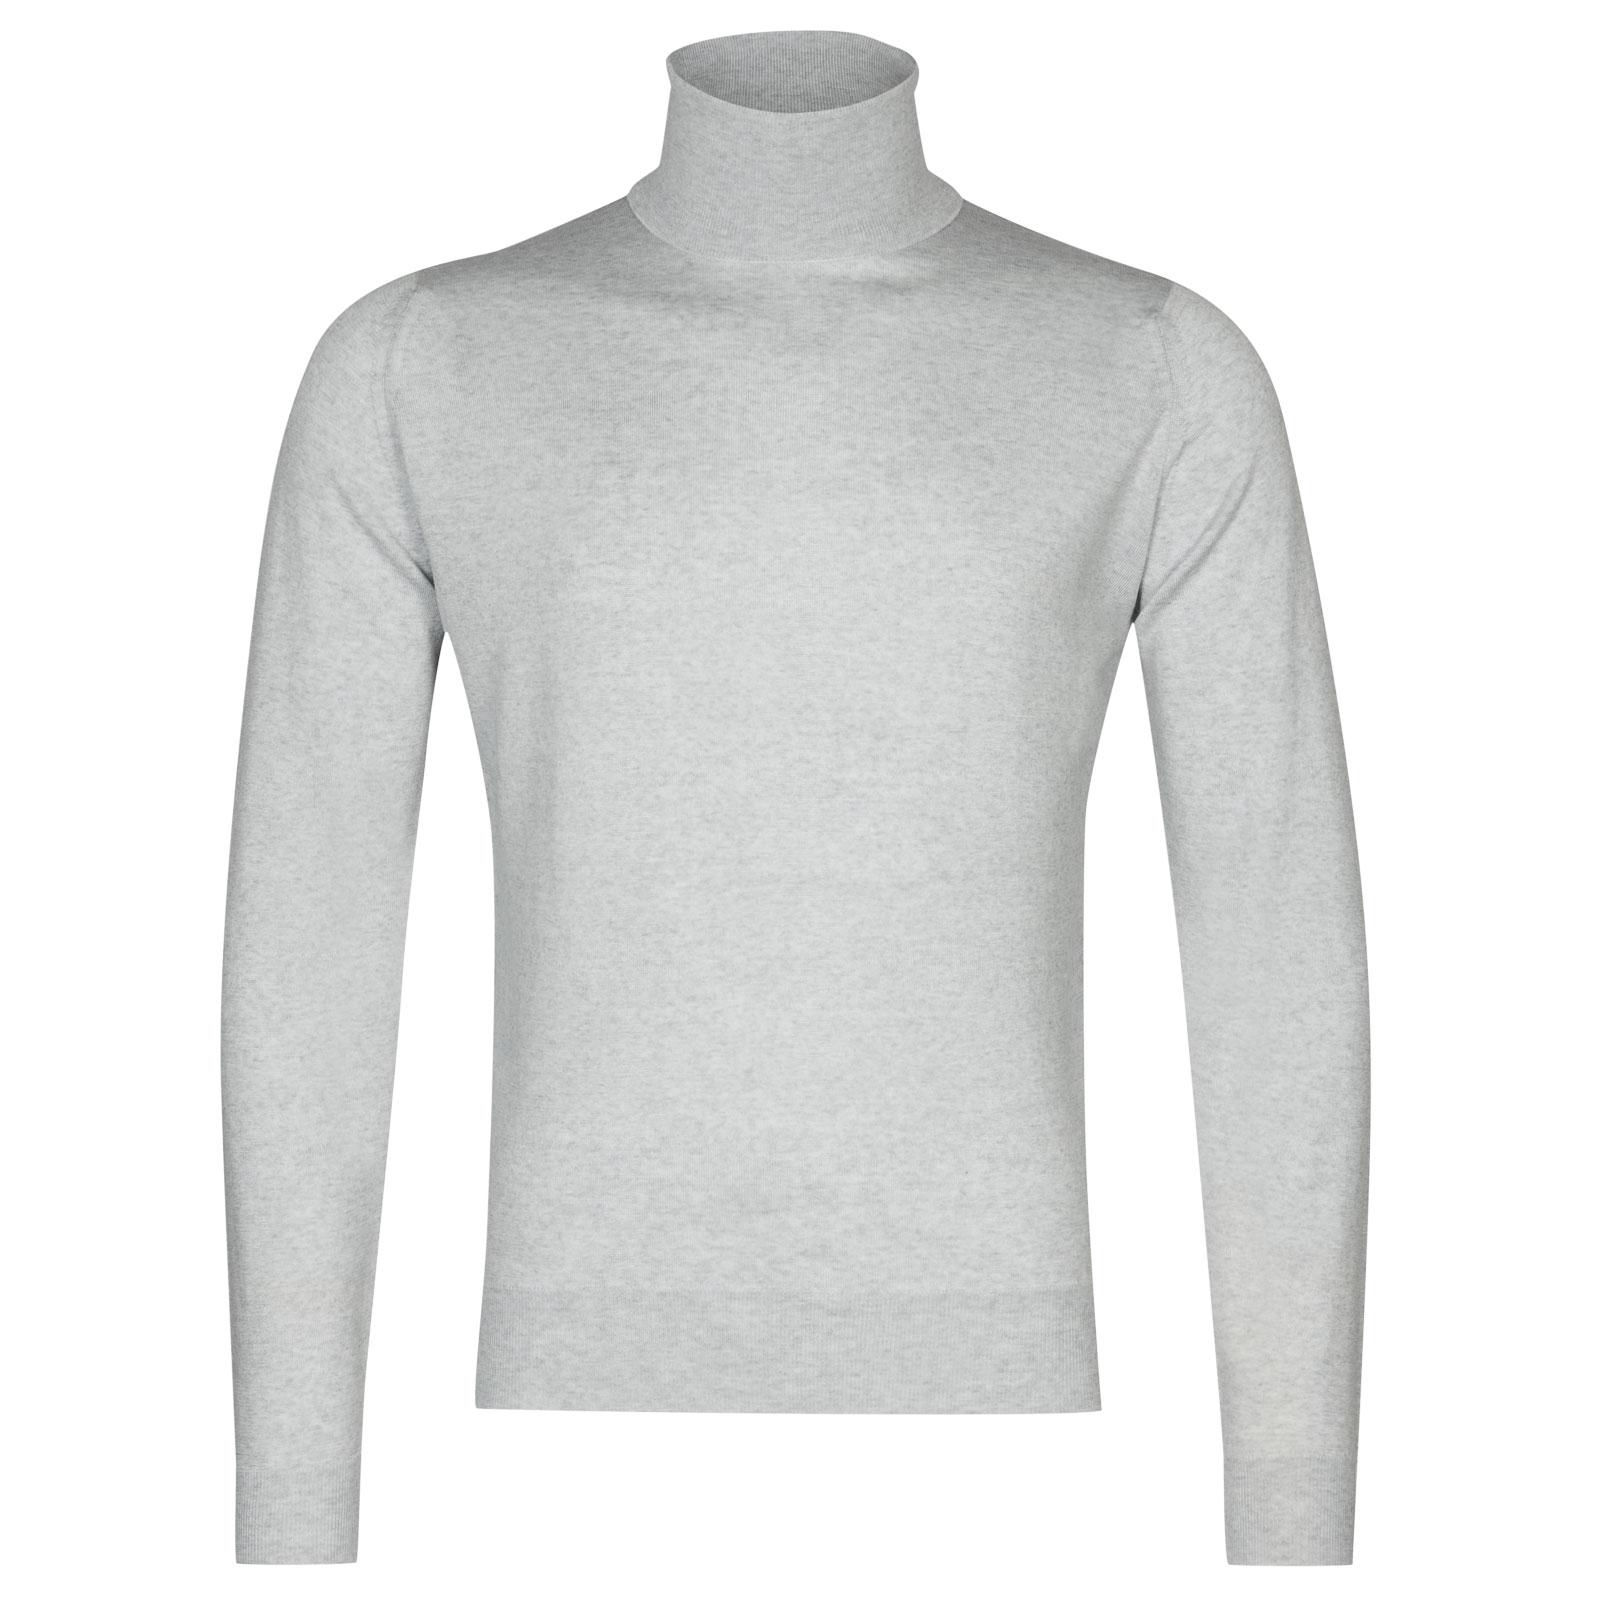 John Smedley Orta Merino Wool Pullover in Bardot Grey-M